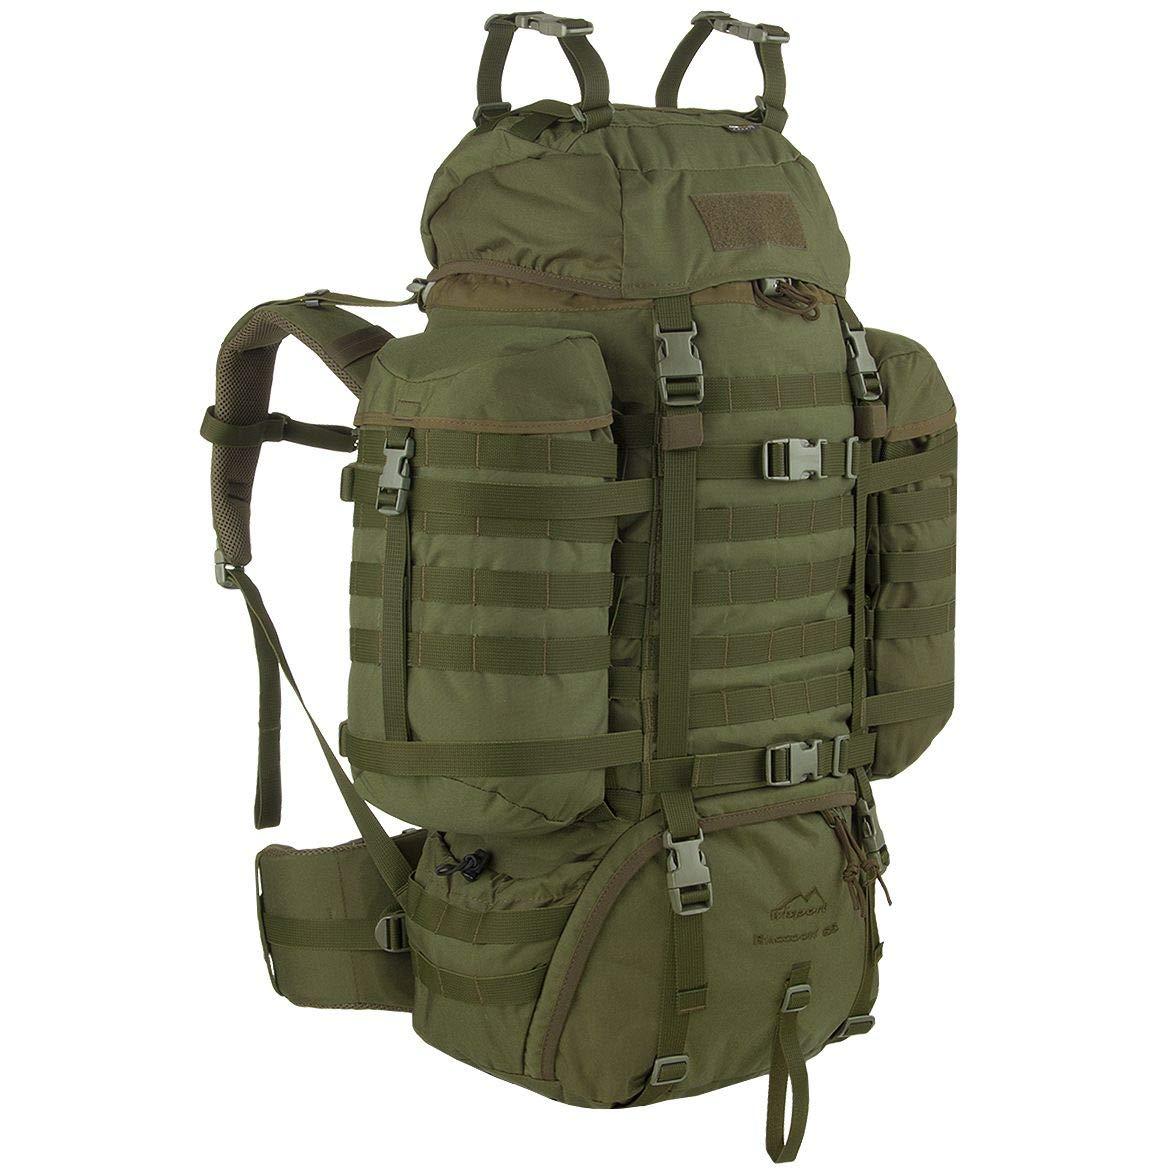 Olive green Sac à dos Militaire Wisport Raccoon 65Litres, Cordura, MOLLE, Survie, Sport, Plein air, Camping, Randonnée, Scoutisme, Trekking